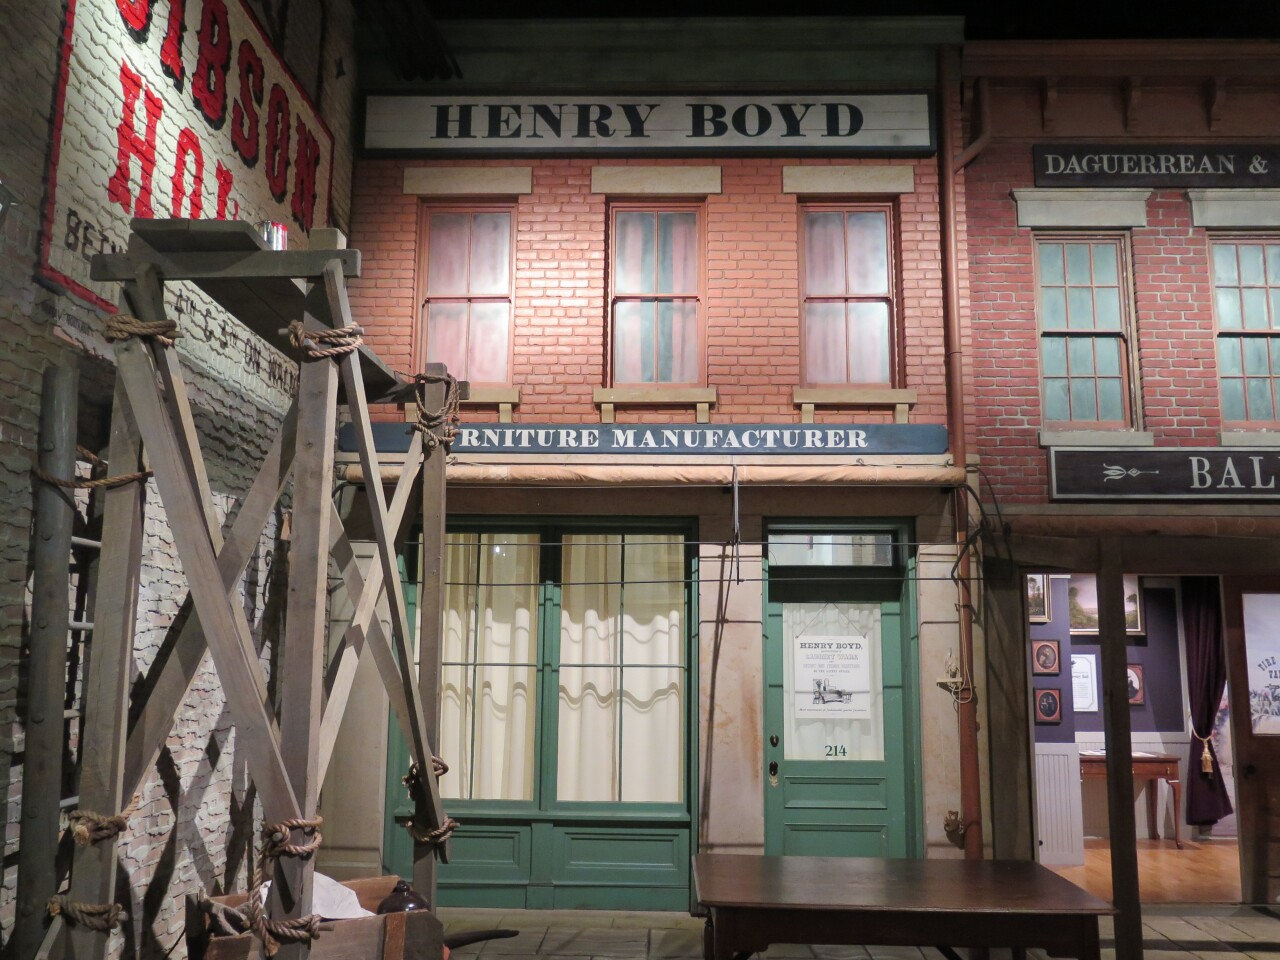 Henry_Boyd_storefront_at_CHM.JPG